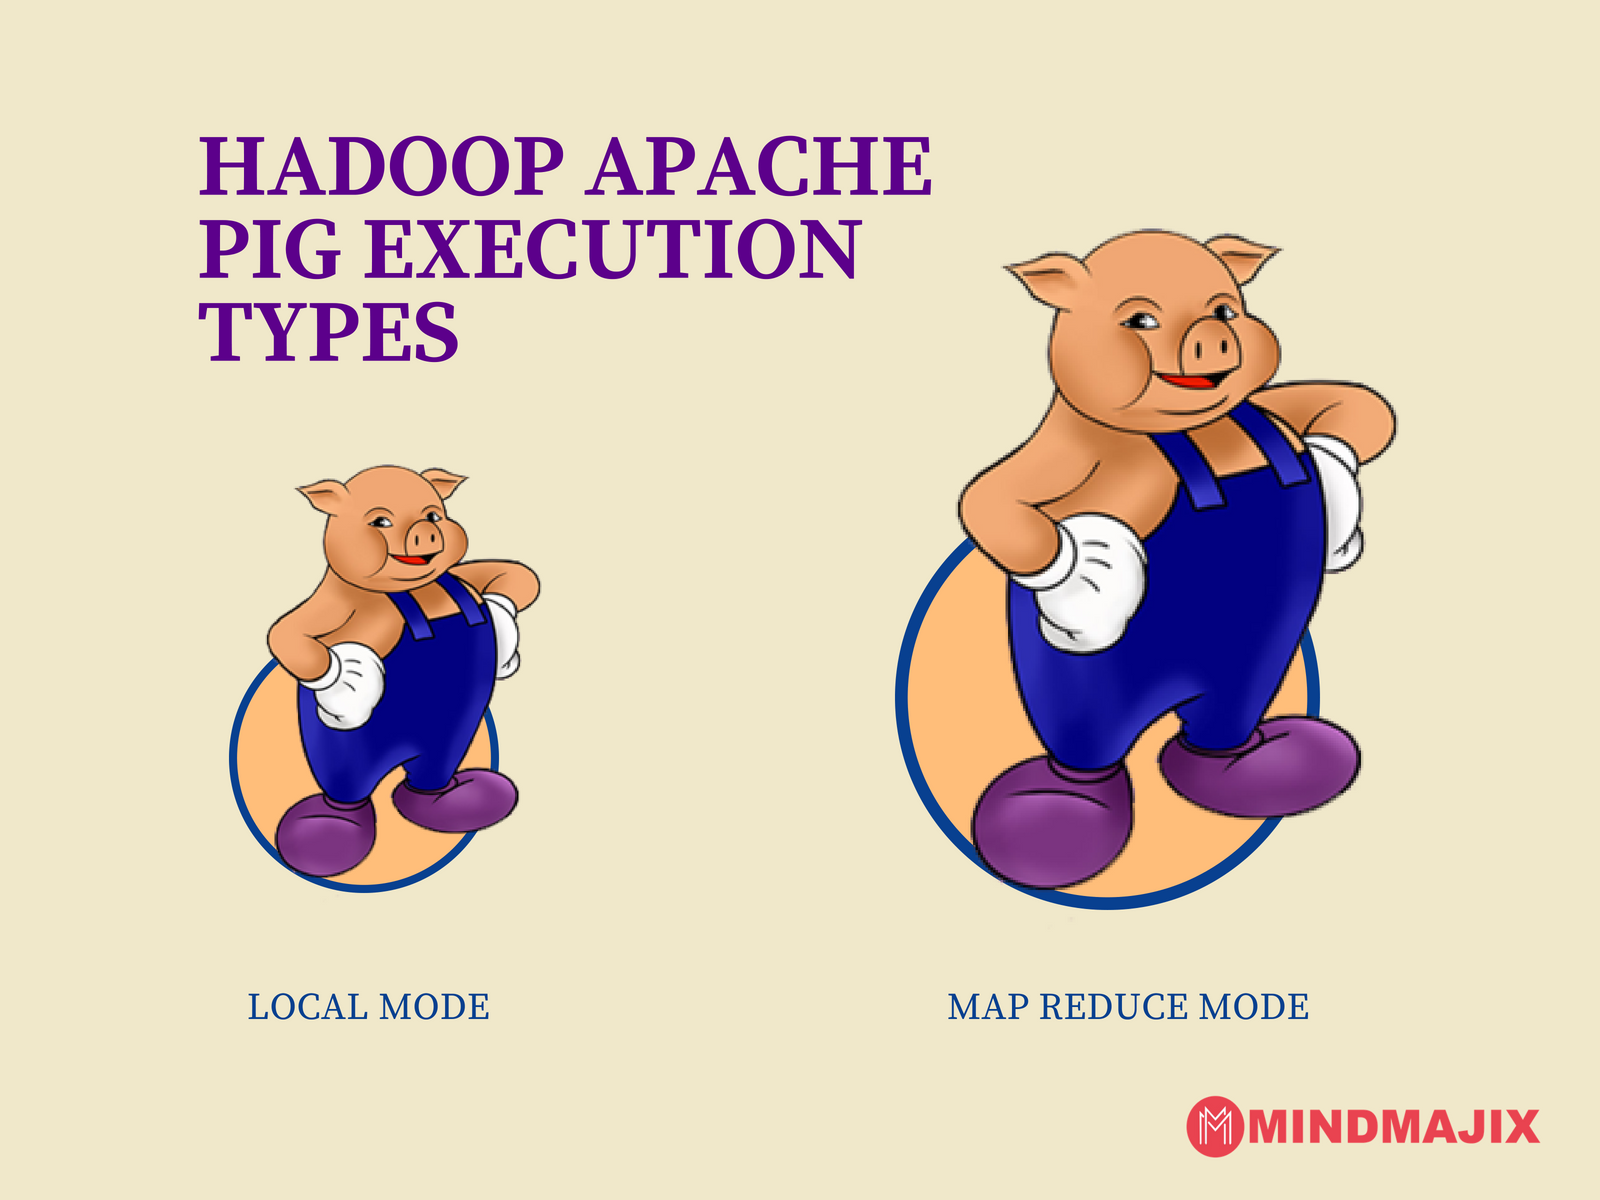 Hadoop Apache Pig Execution Types